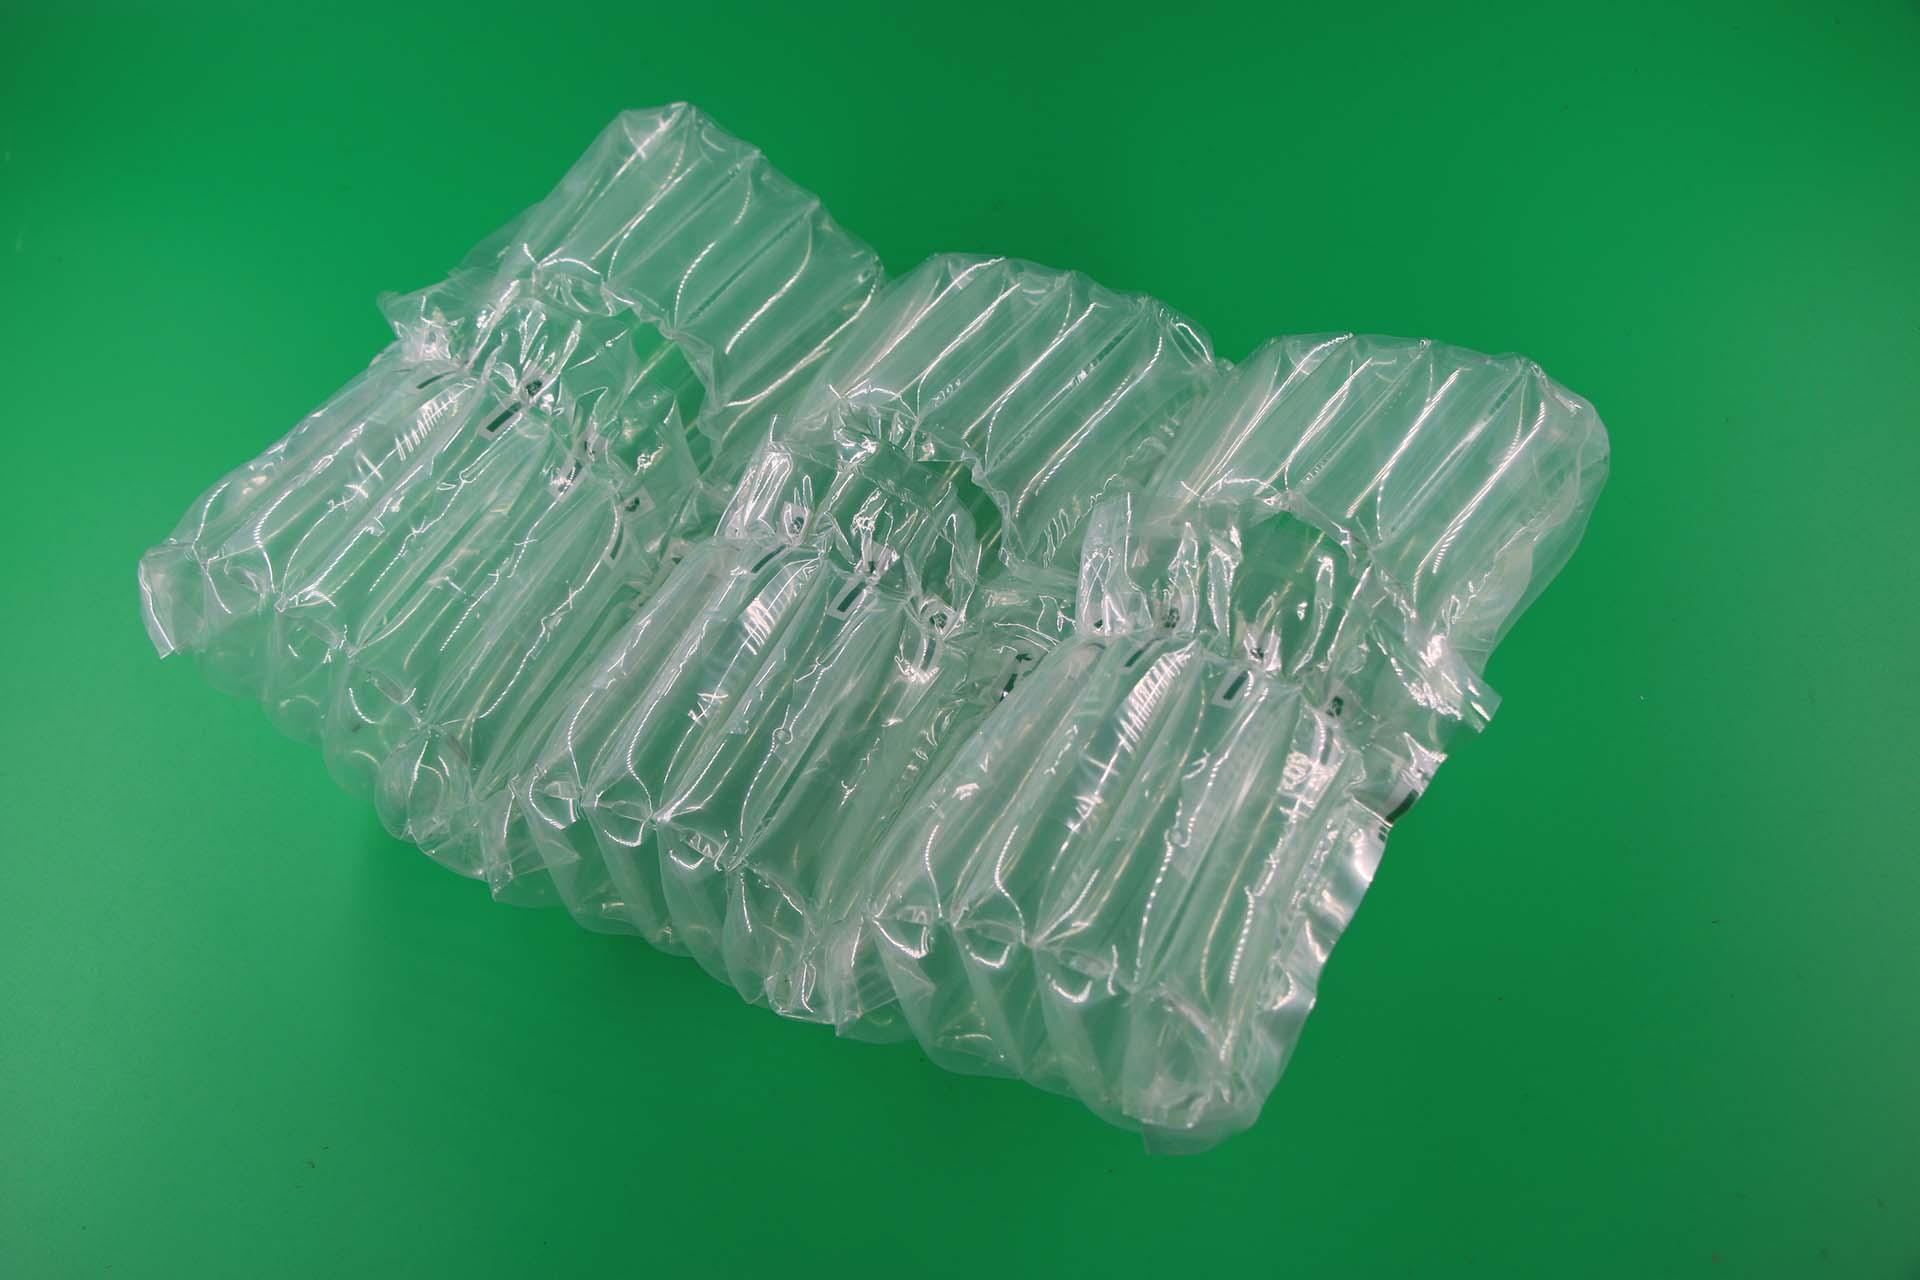 Sunshinepack ODM toner cartridge airbag Supply for packing-3